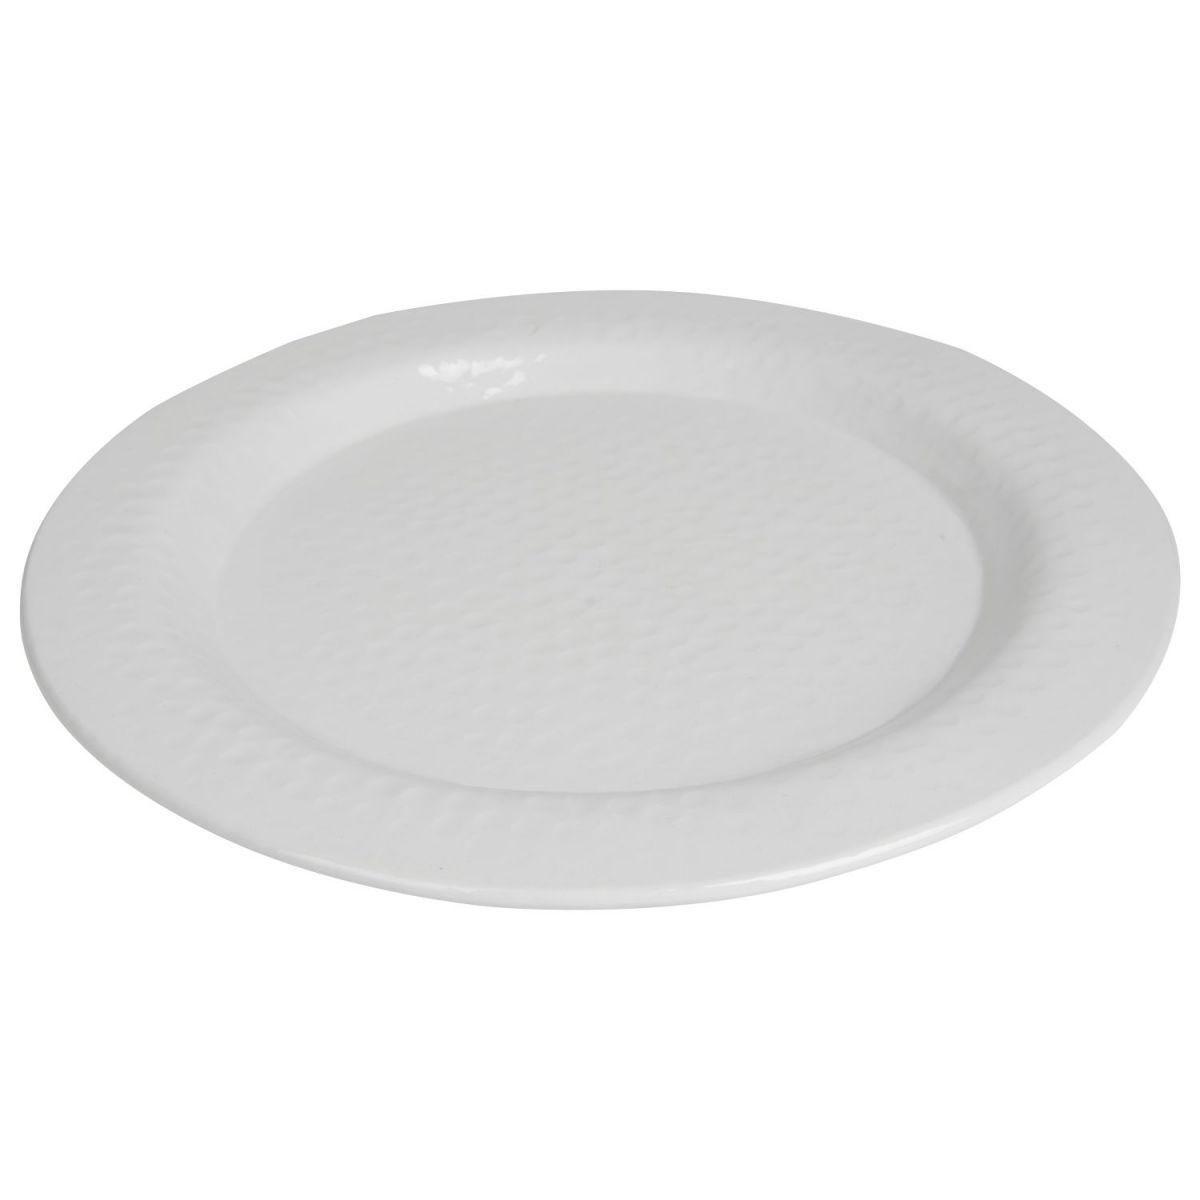 bord rond gehamerd wit 39cm